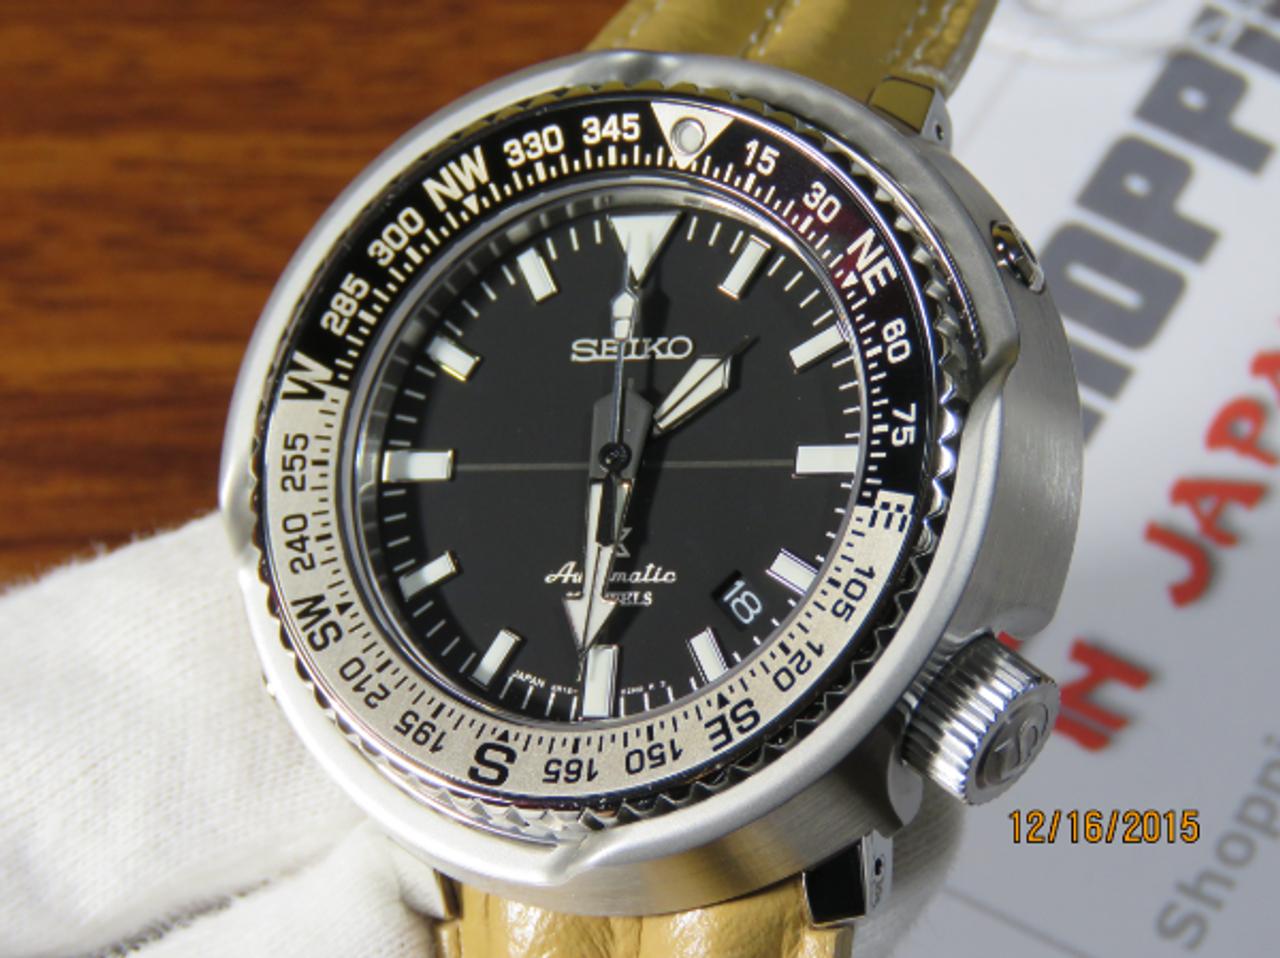 Prospex Fieldmaster SBDC035